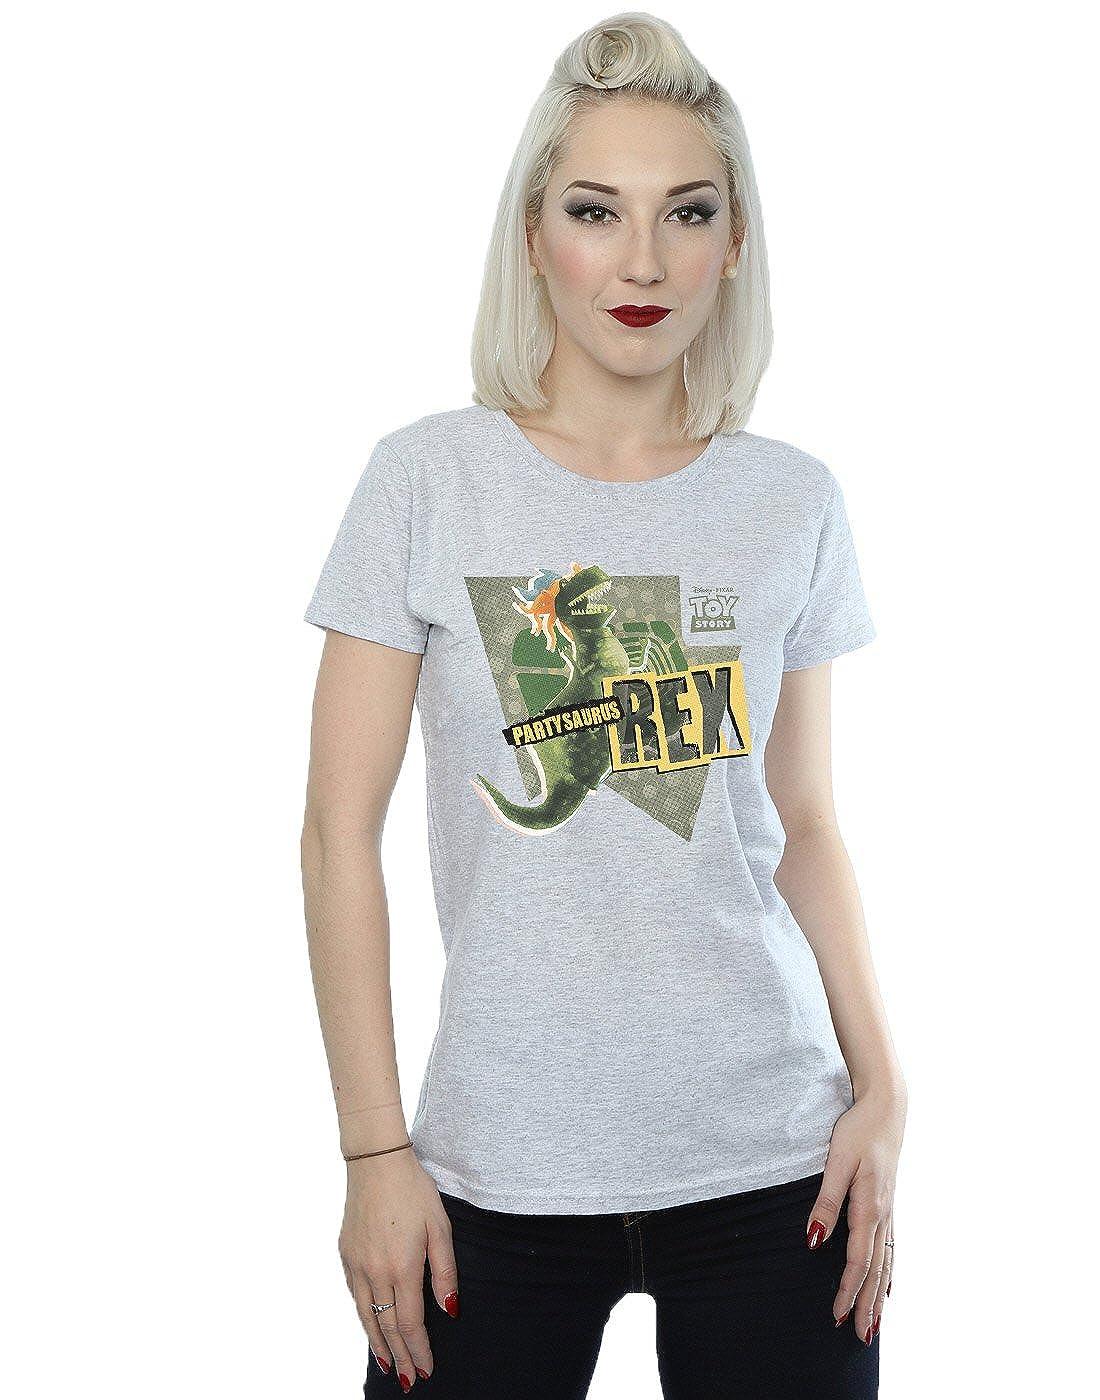 Disney Womens Toy Story Partysaurus Rex T-Shirt